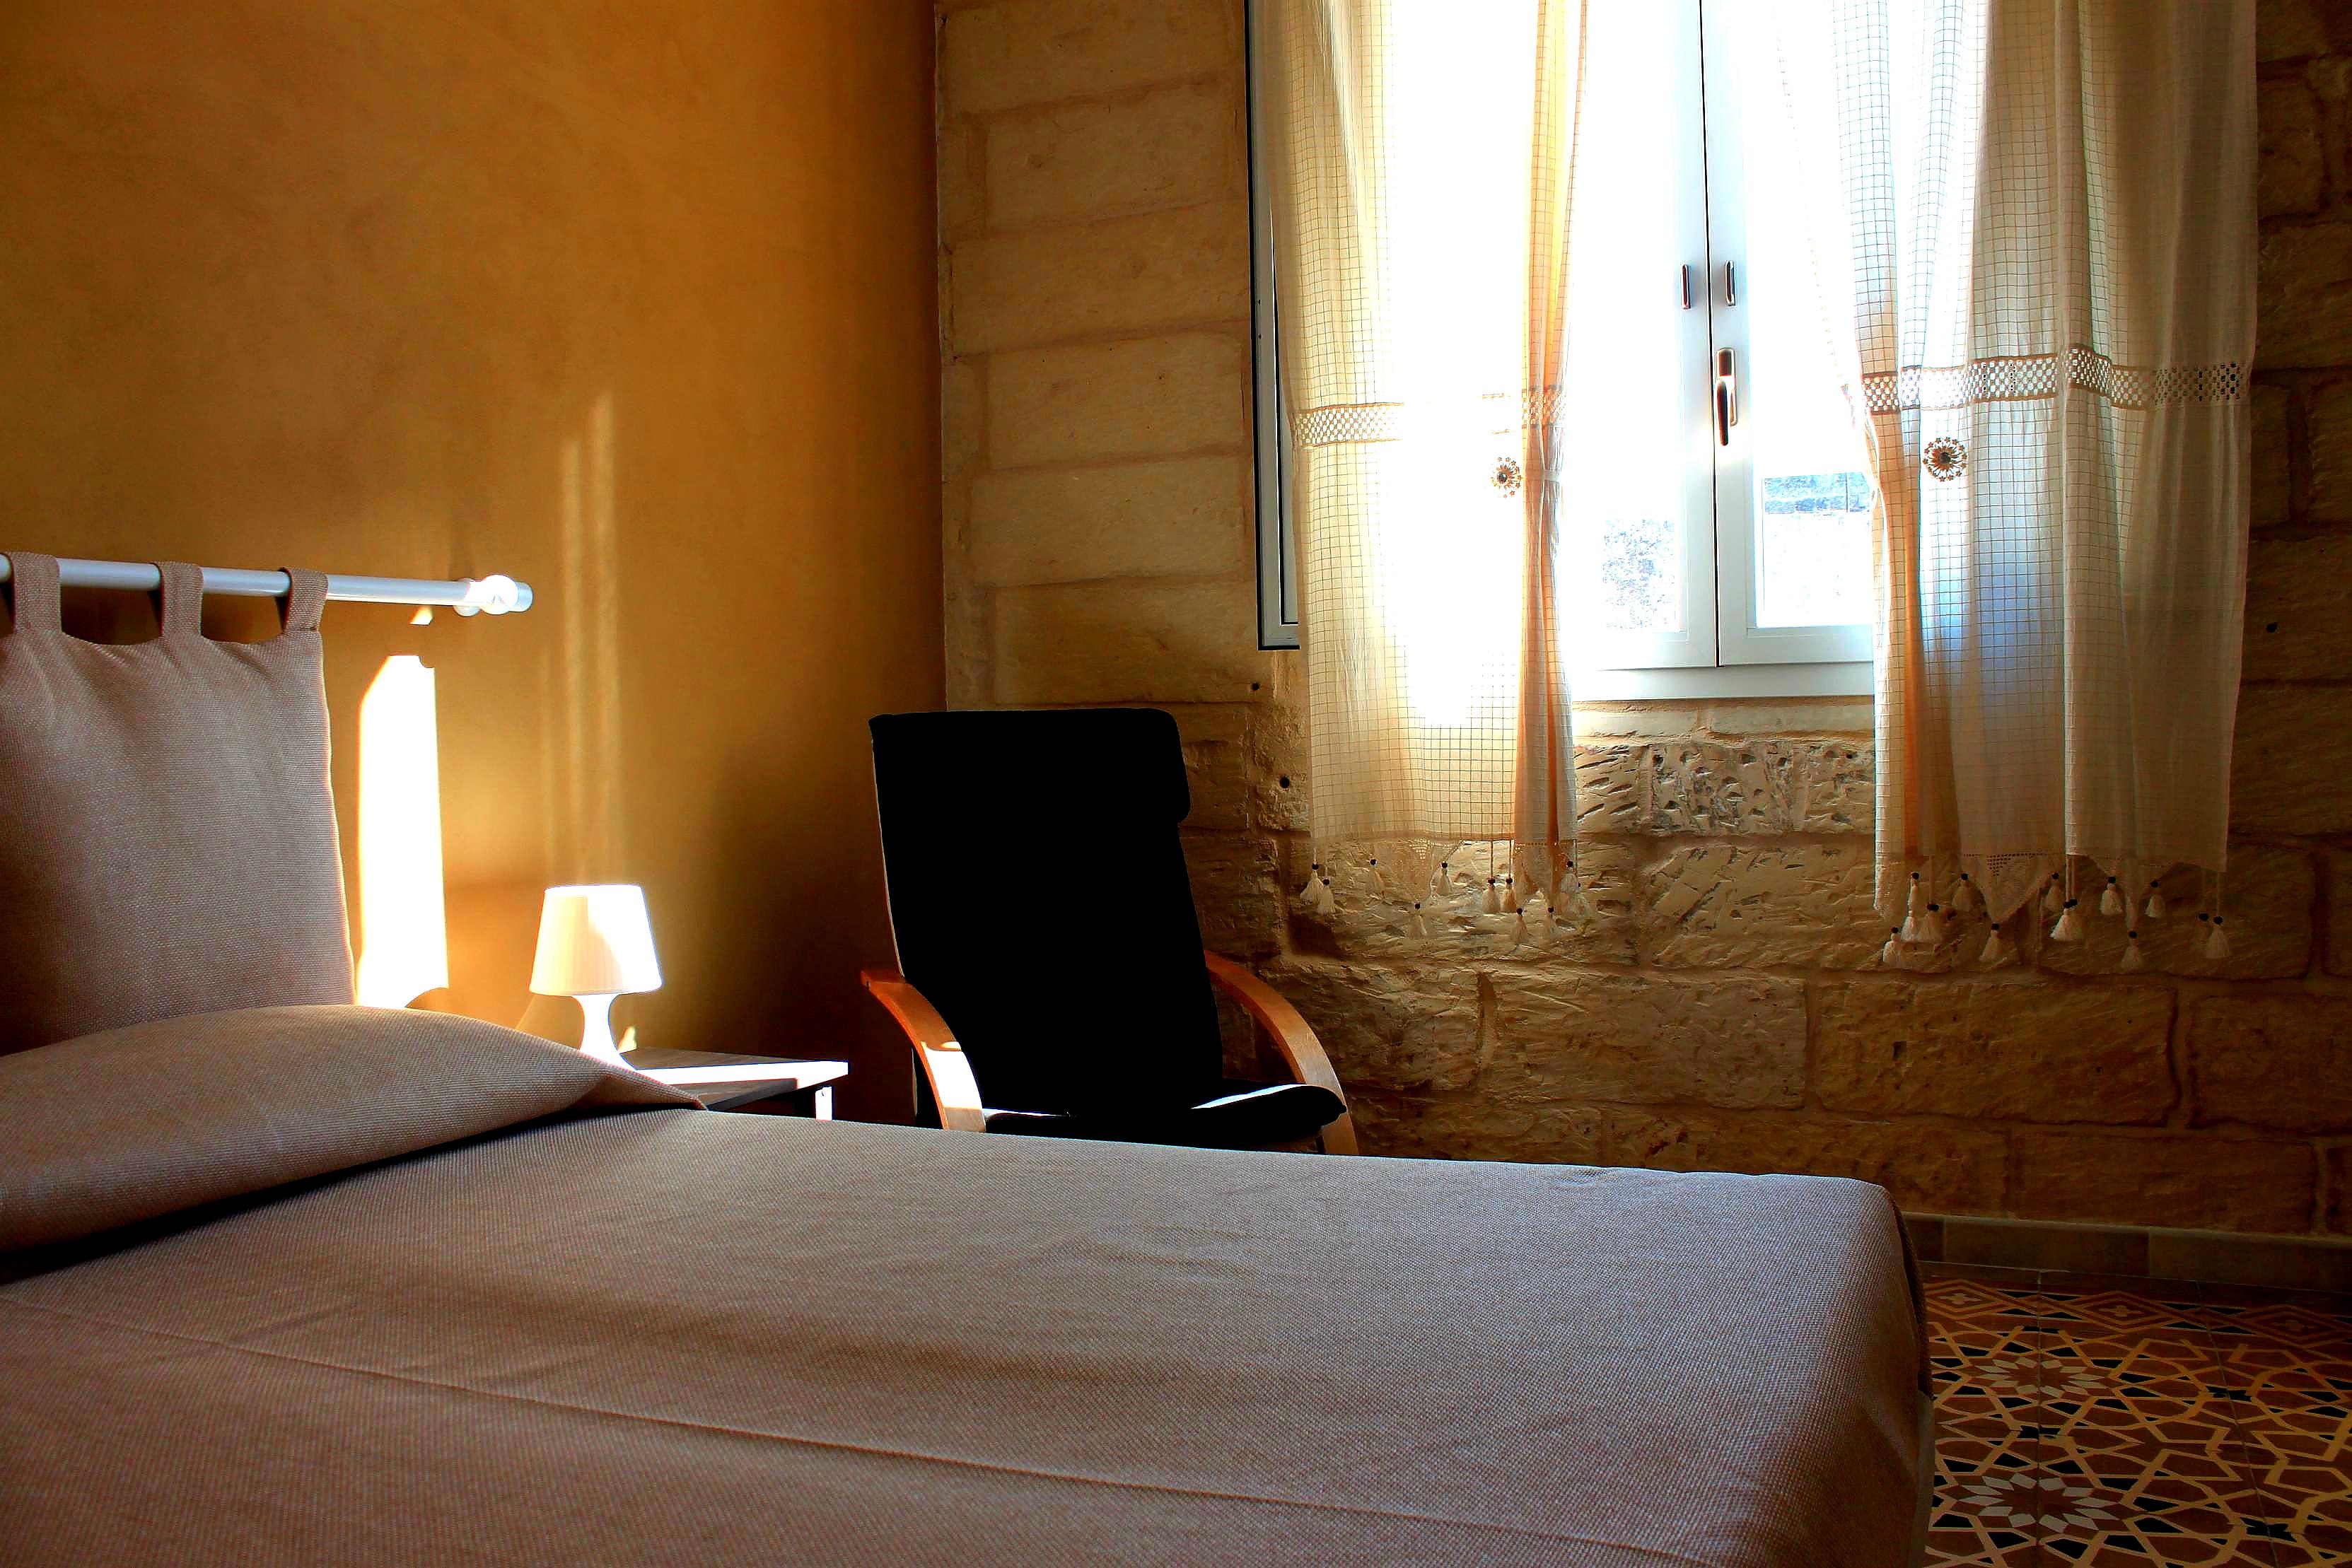 Vico San Martino Bed&Breakfast